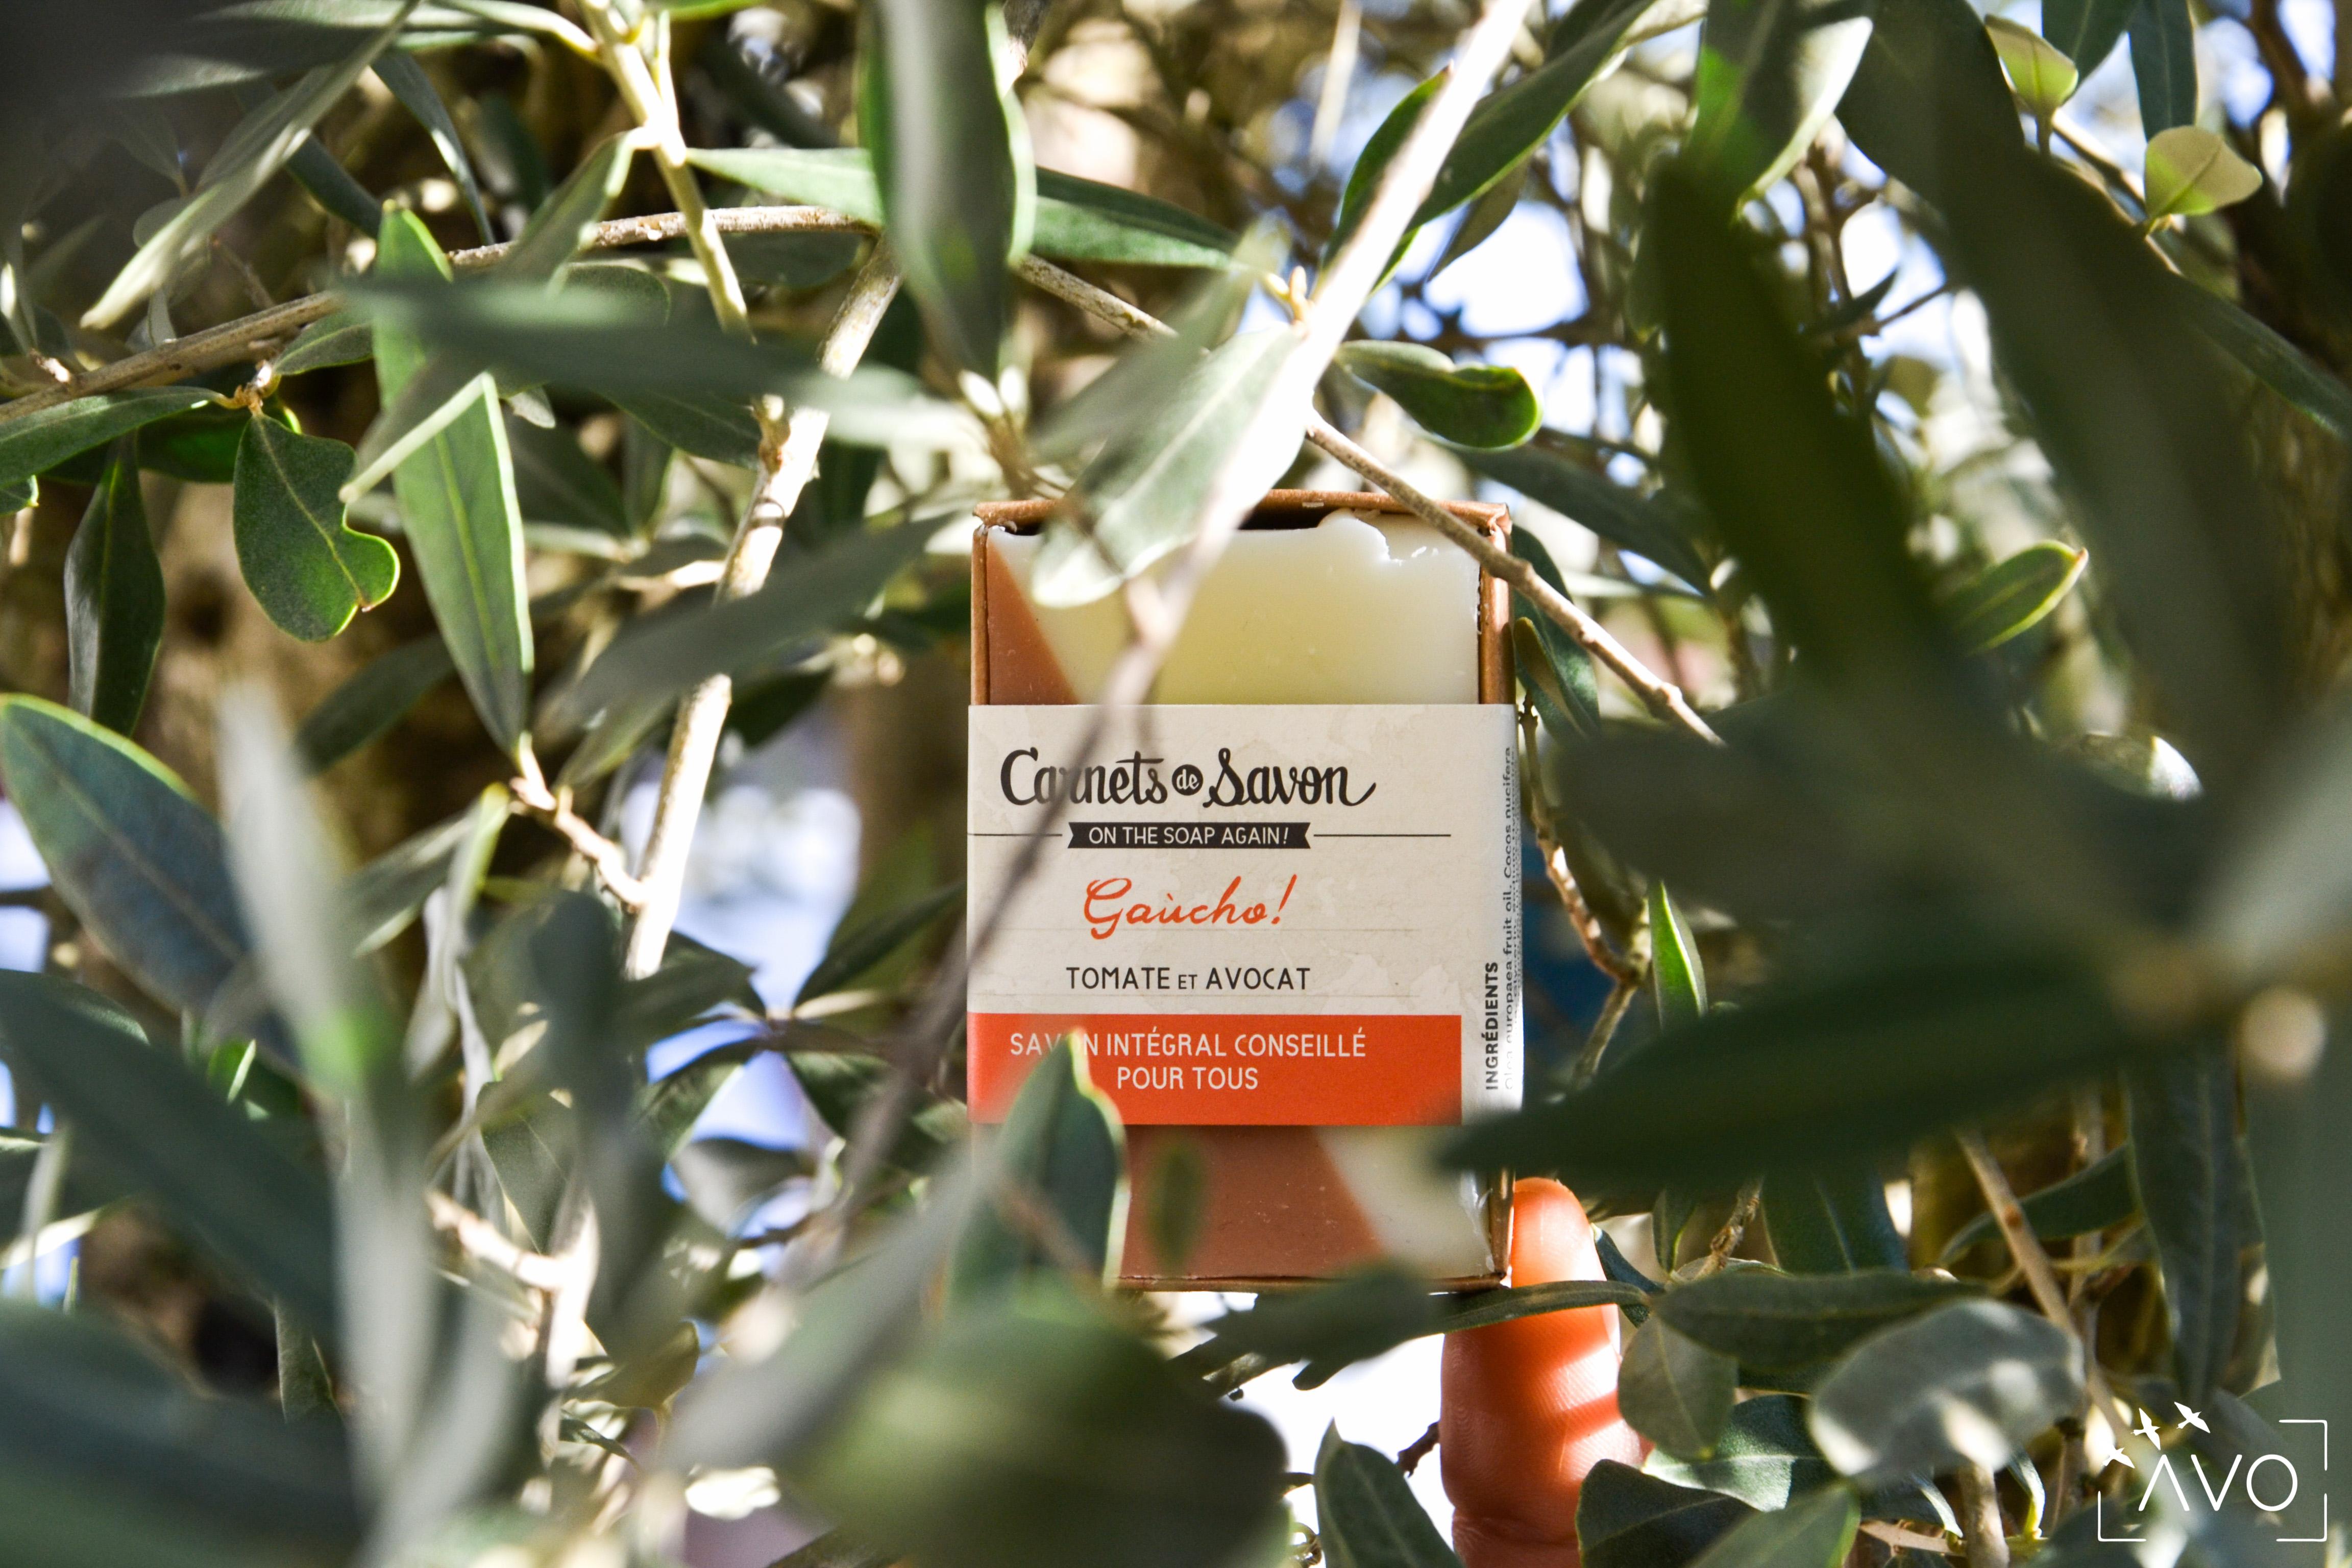 savons naturels avo ecologie savon cosmétique naturel carnets de savon olivier